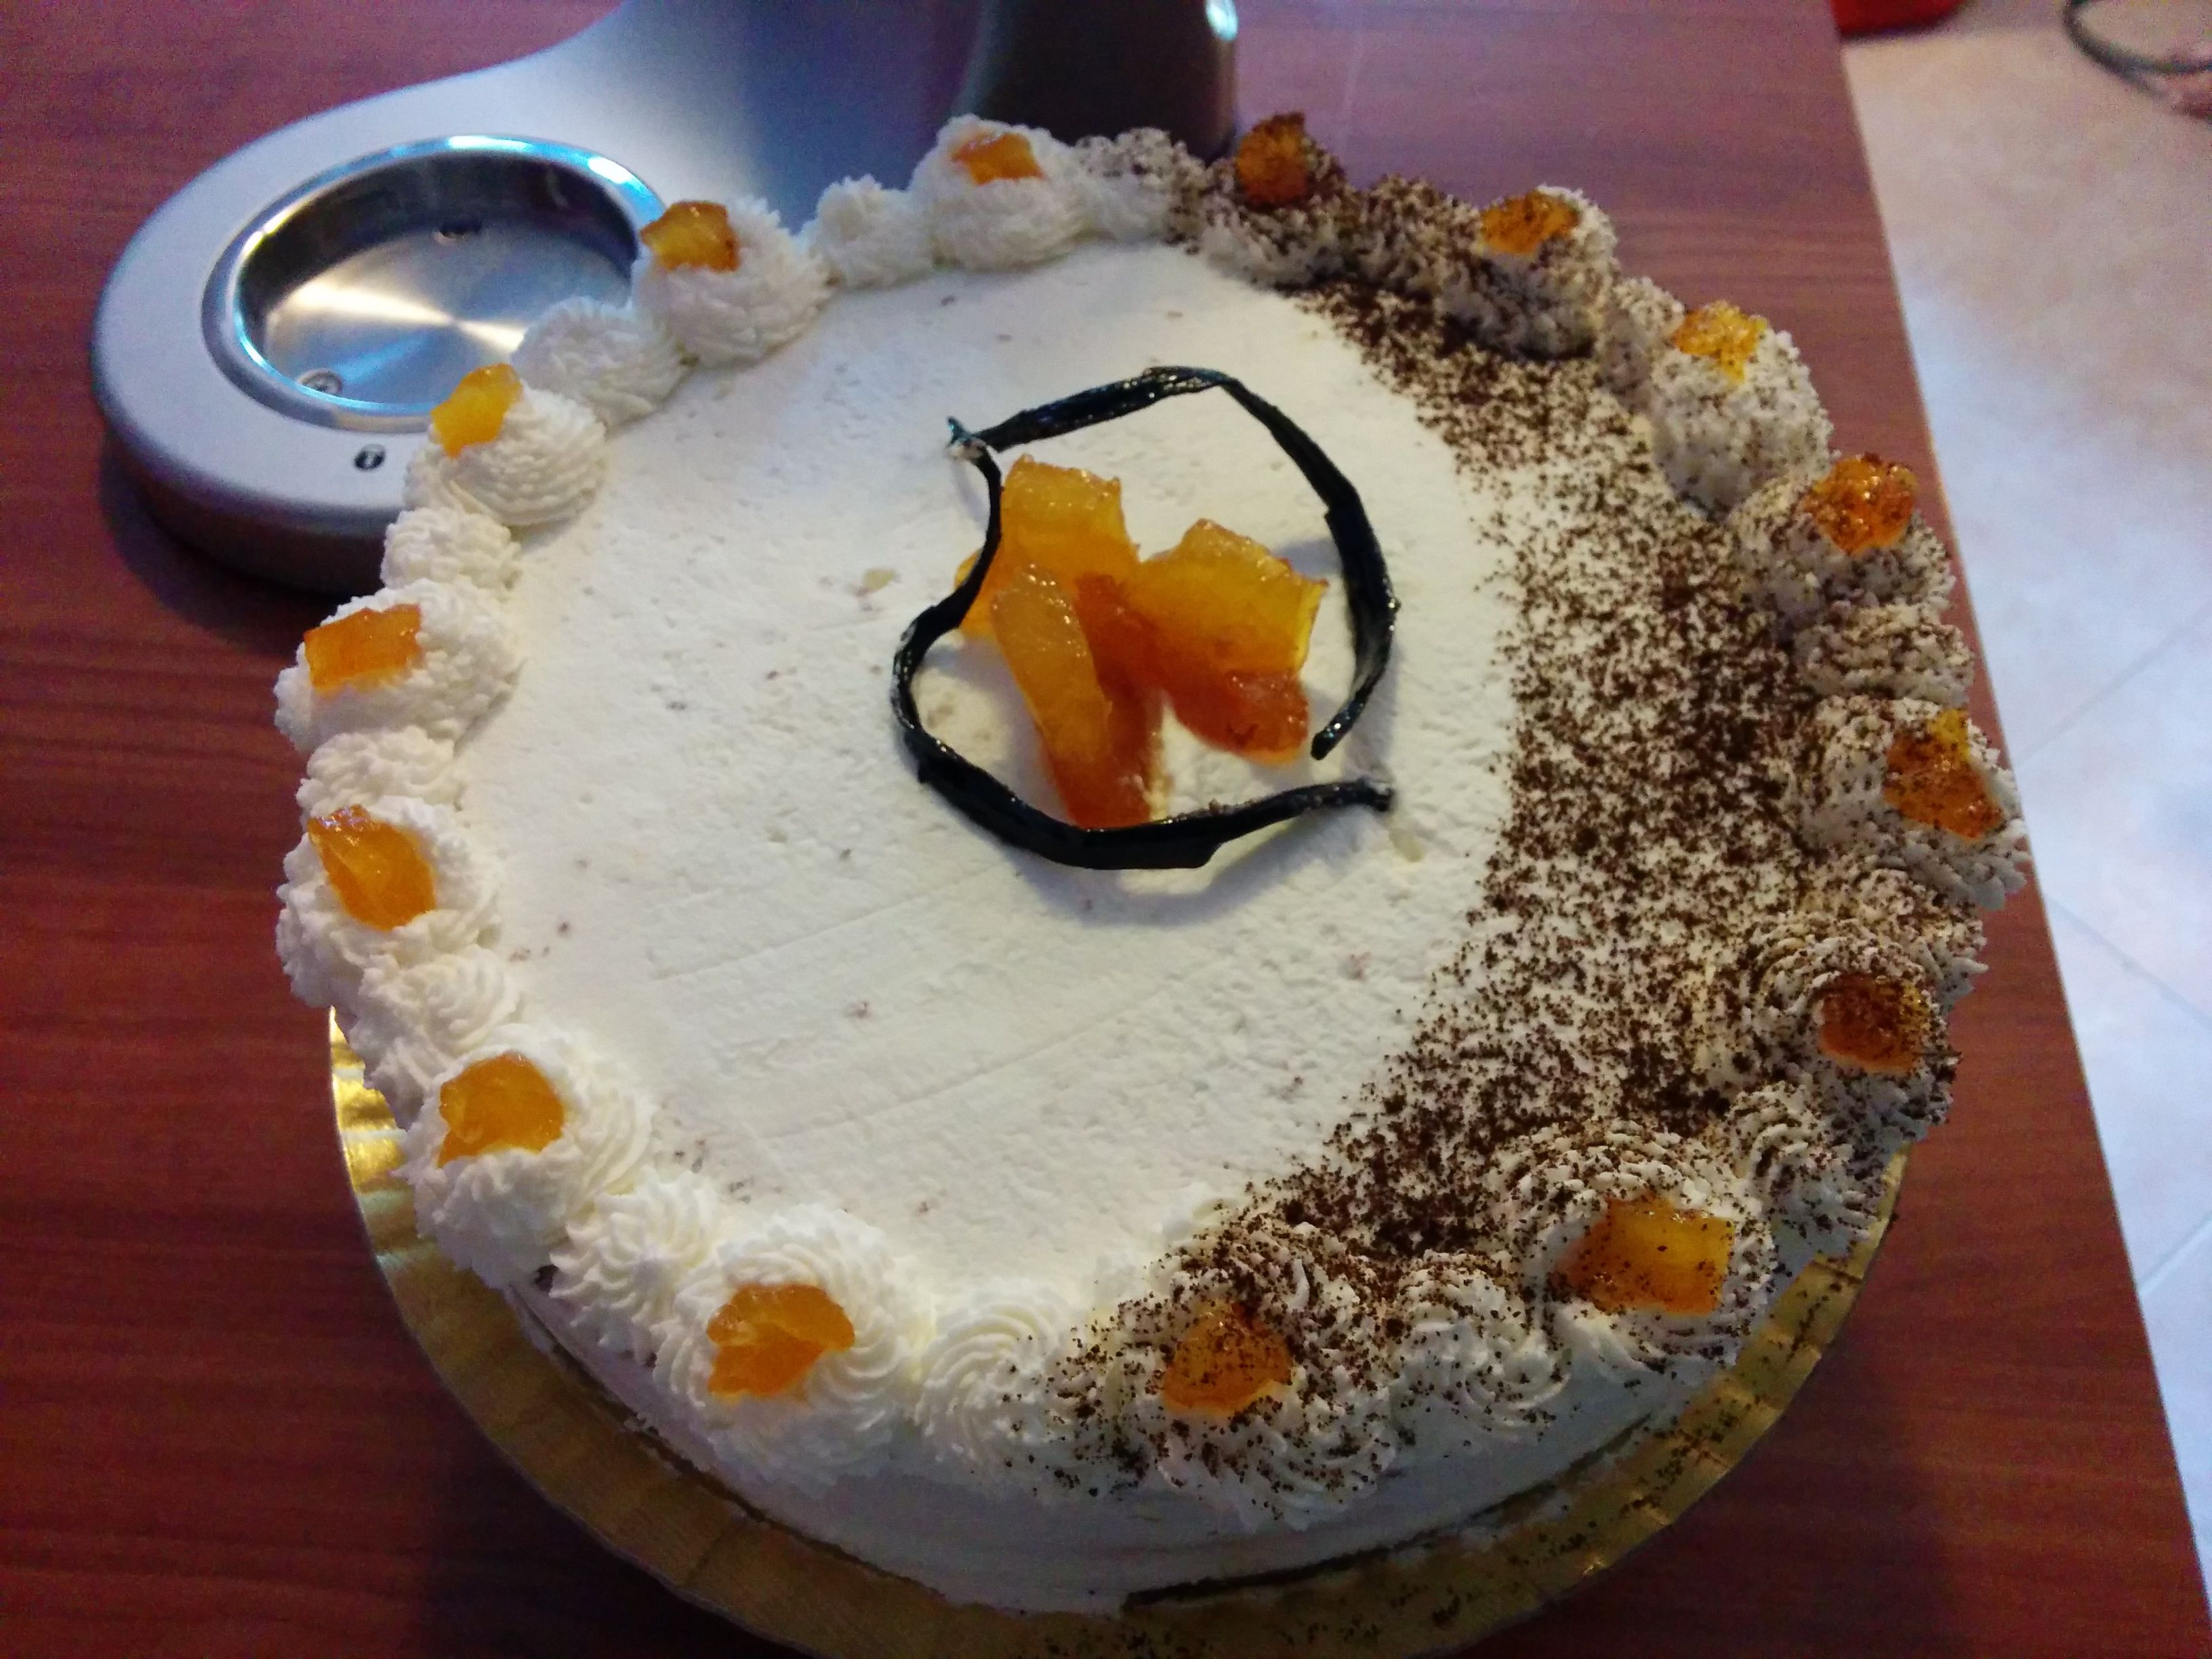 Semplice torta con mousseline al caffè...